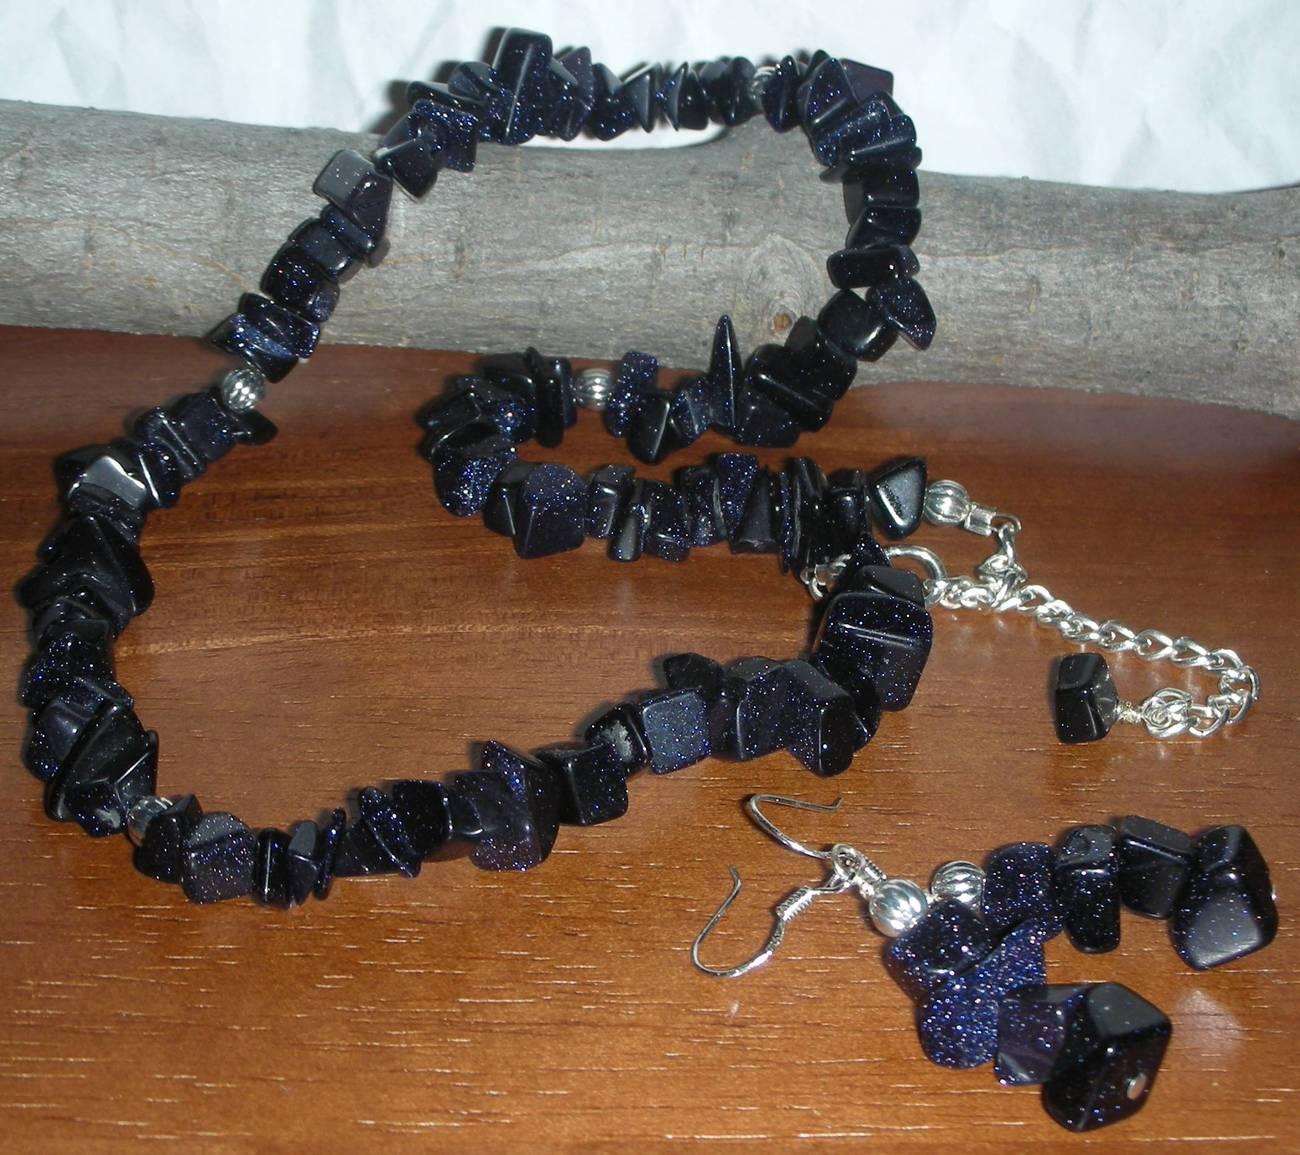 Sunsitara chip necklace